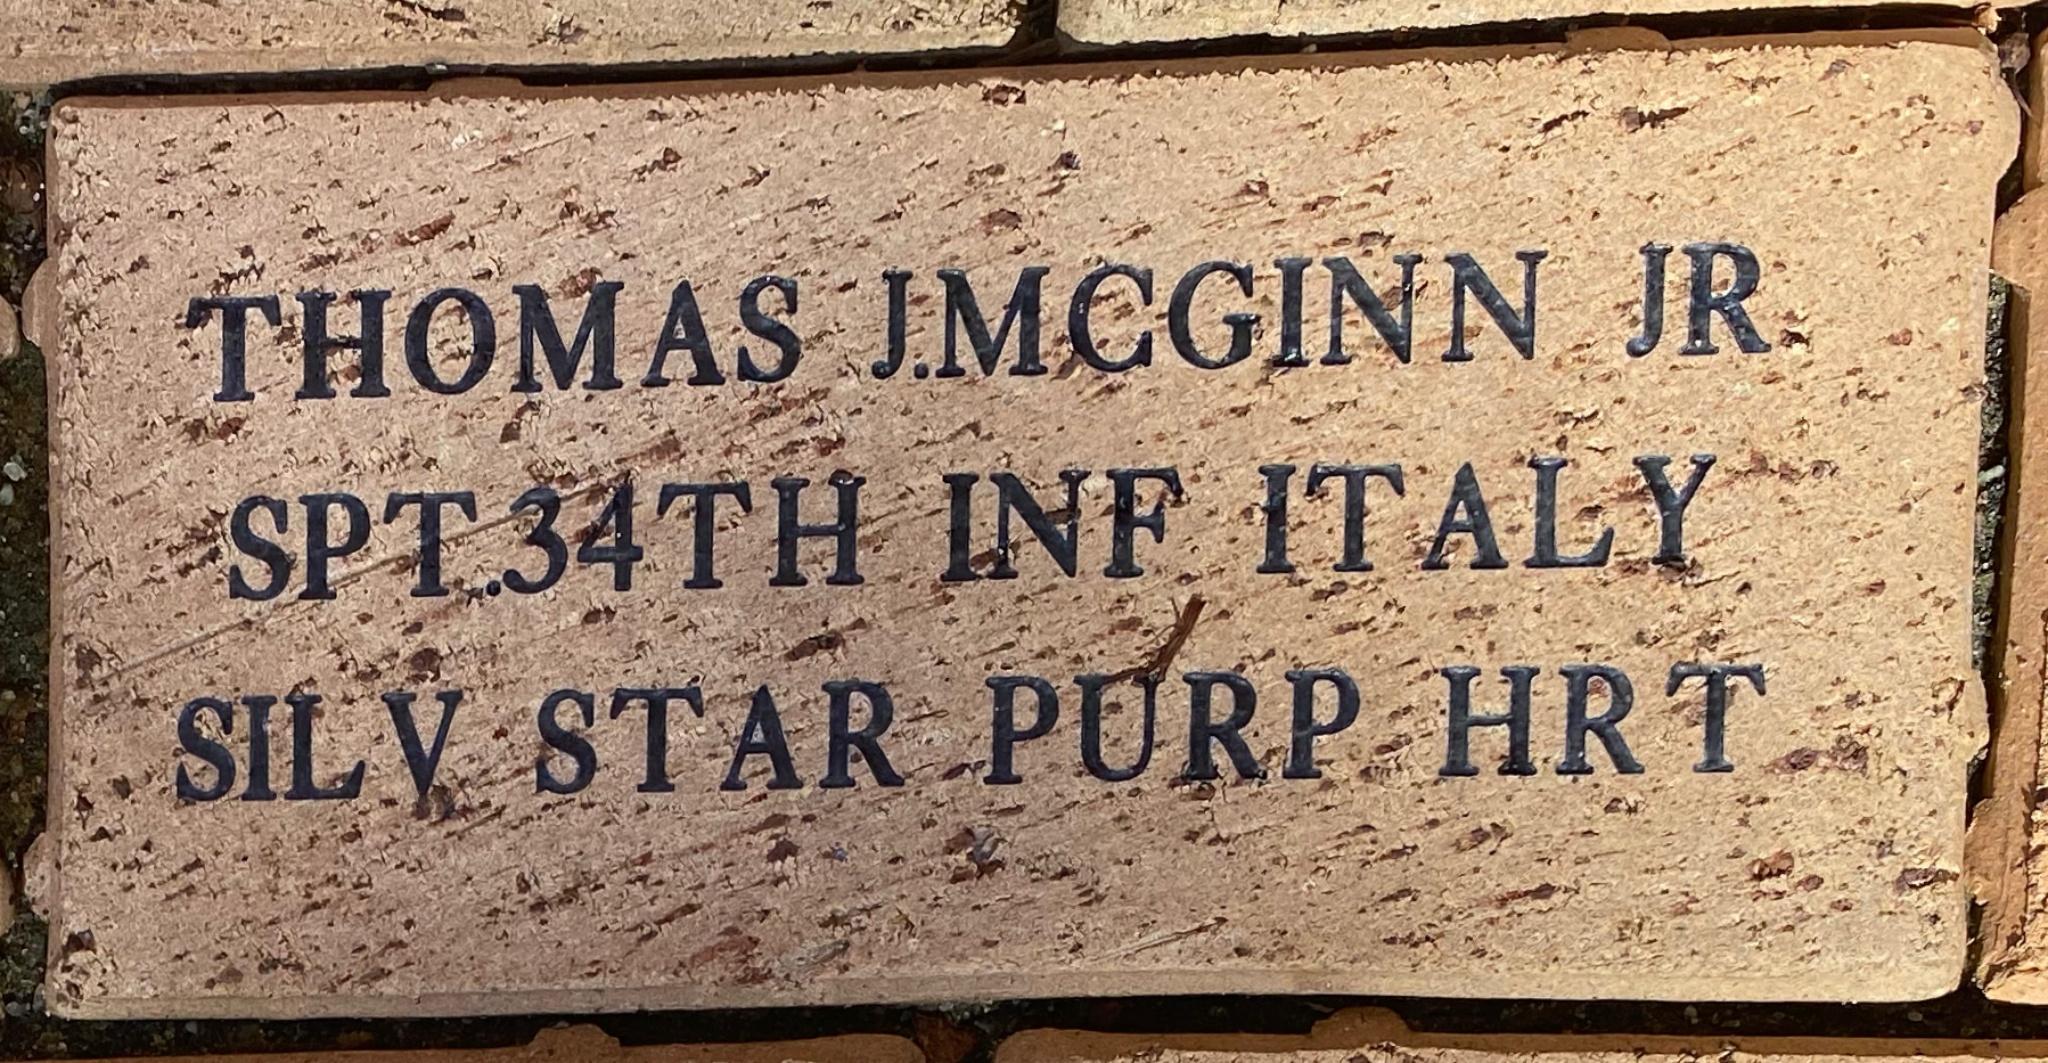 THOMAS J.MCGINN JR SPT 34TH INF ITALY SILV STAR PURP HRT